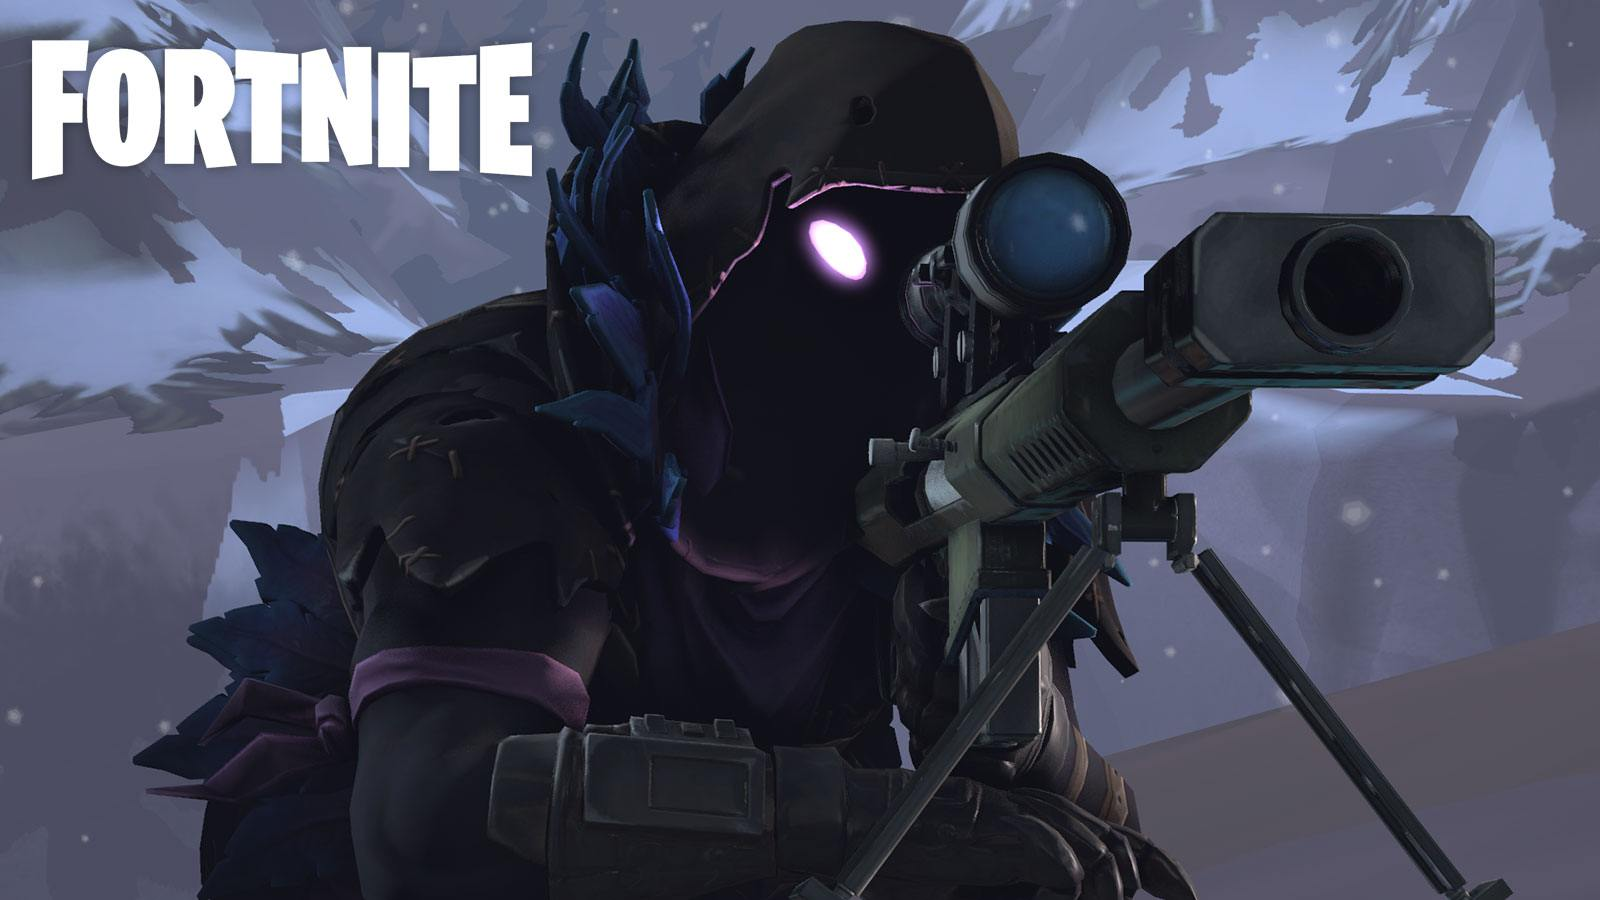 Fortnite sniper raven Epic Games